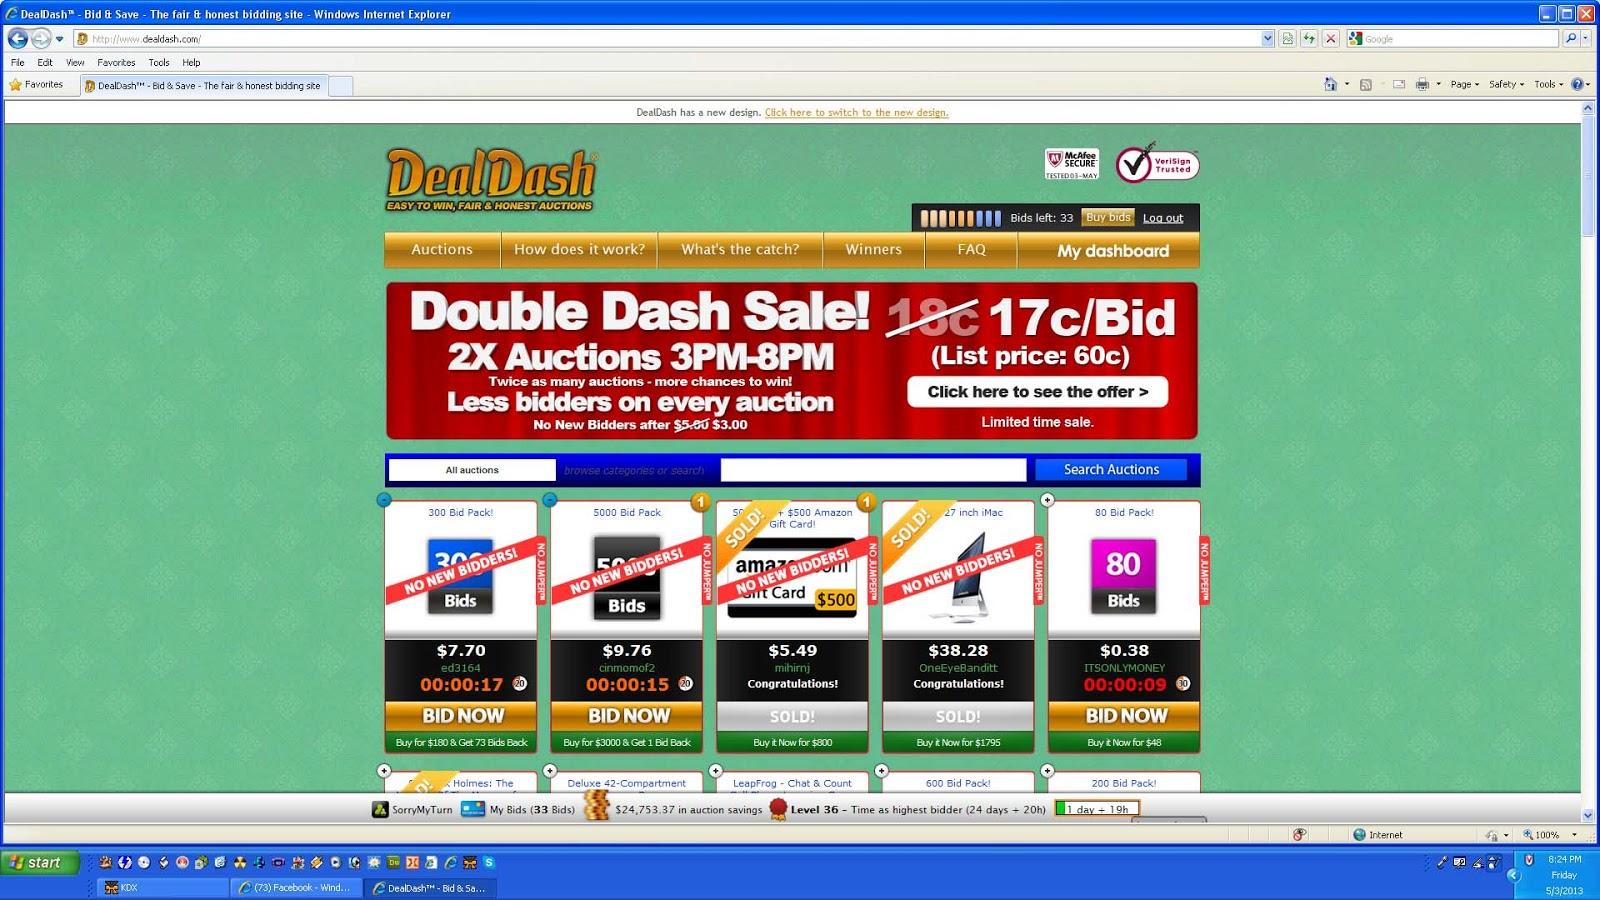 DealDash Shopping Overbidding on Bid Packages